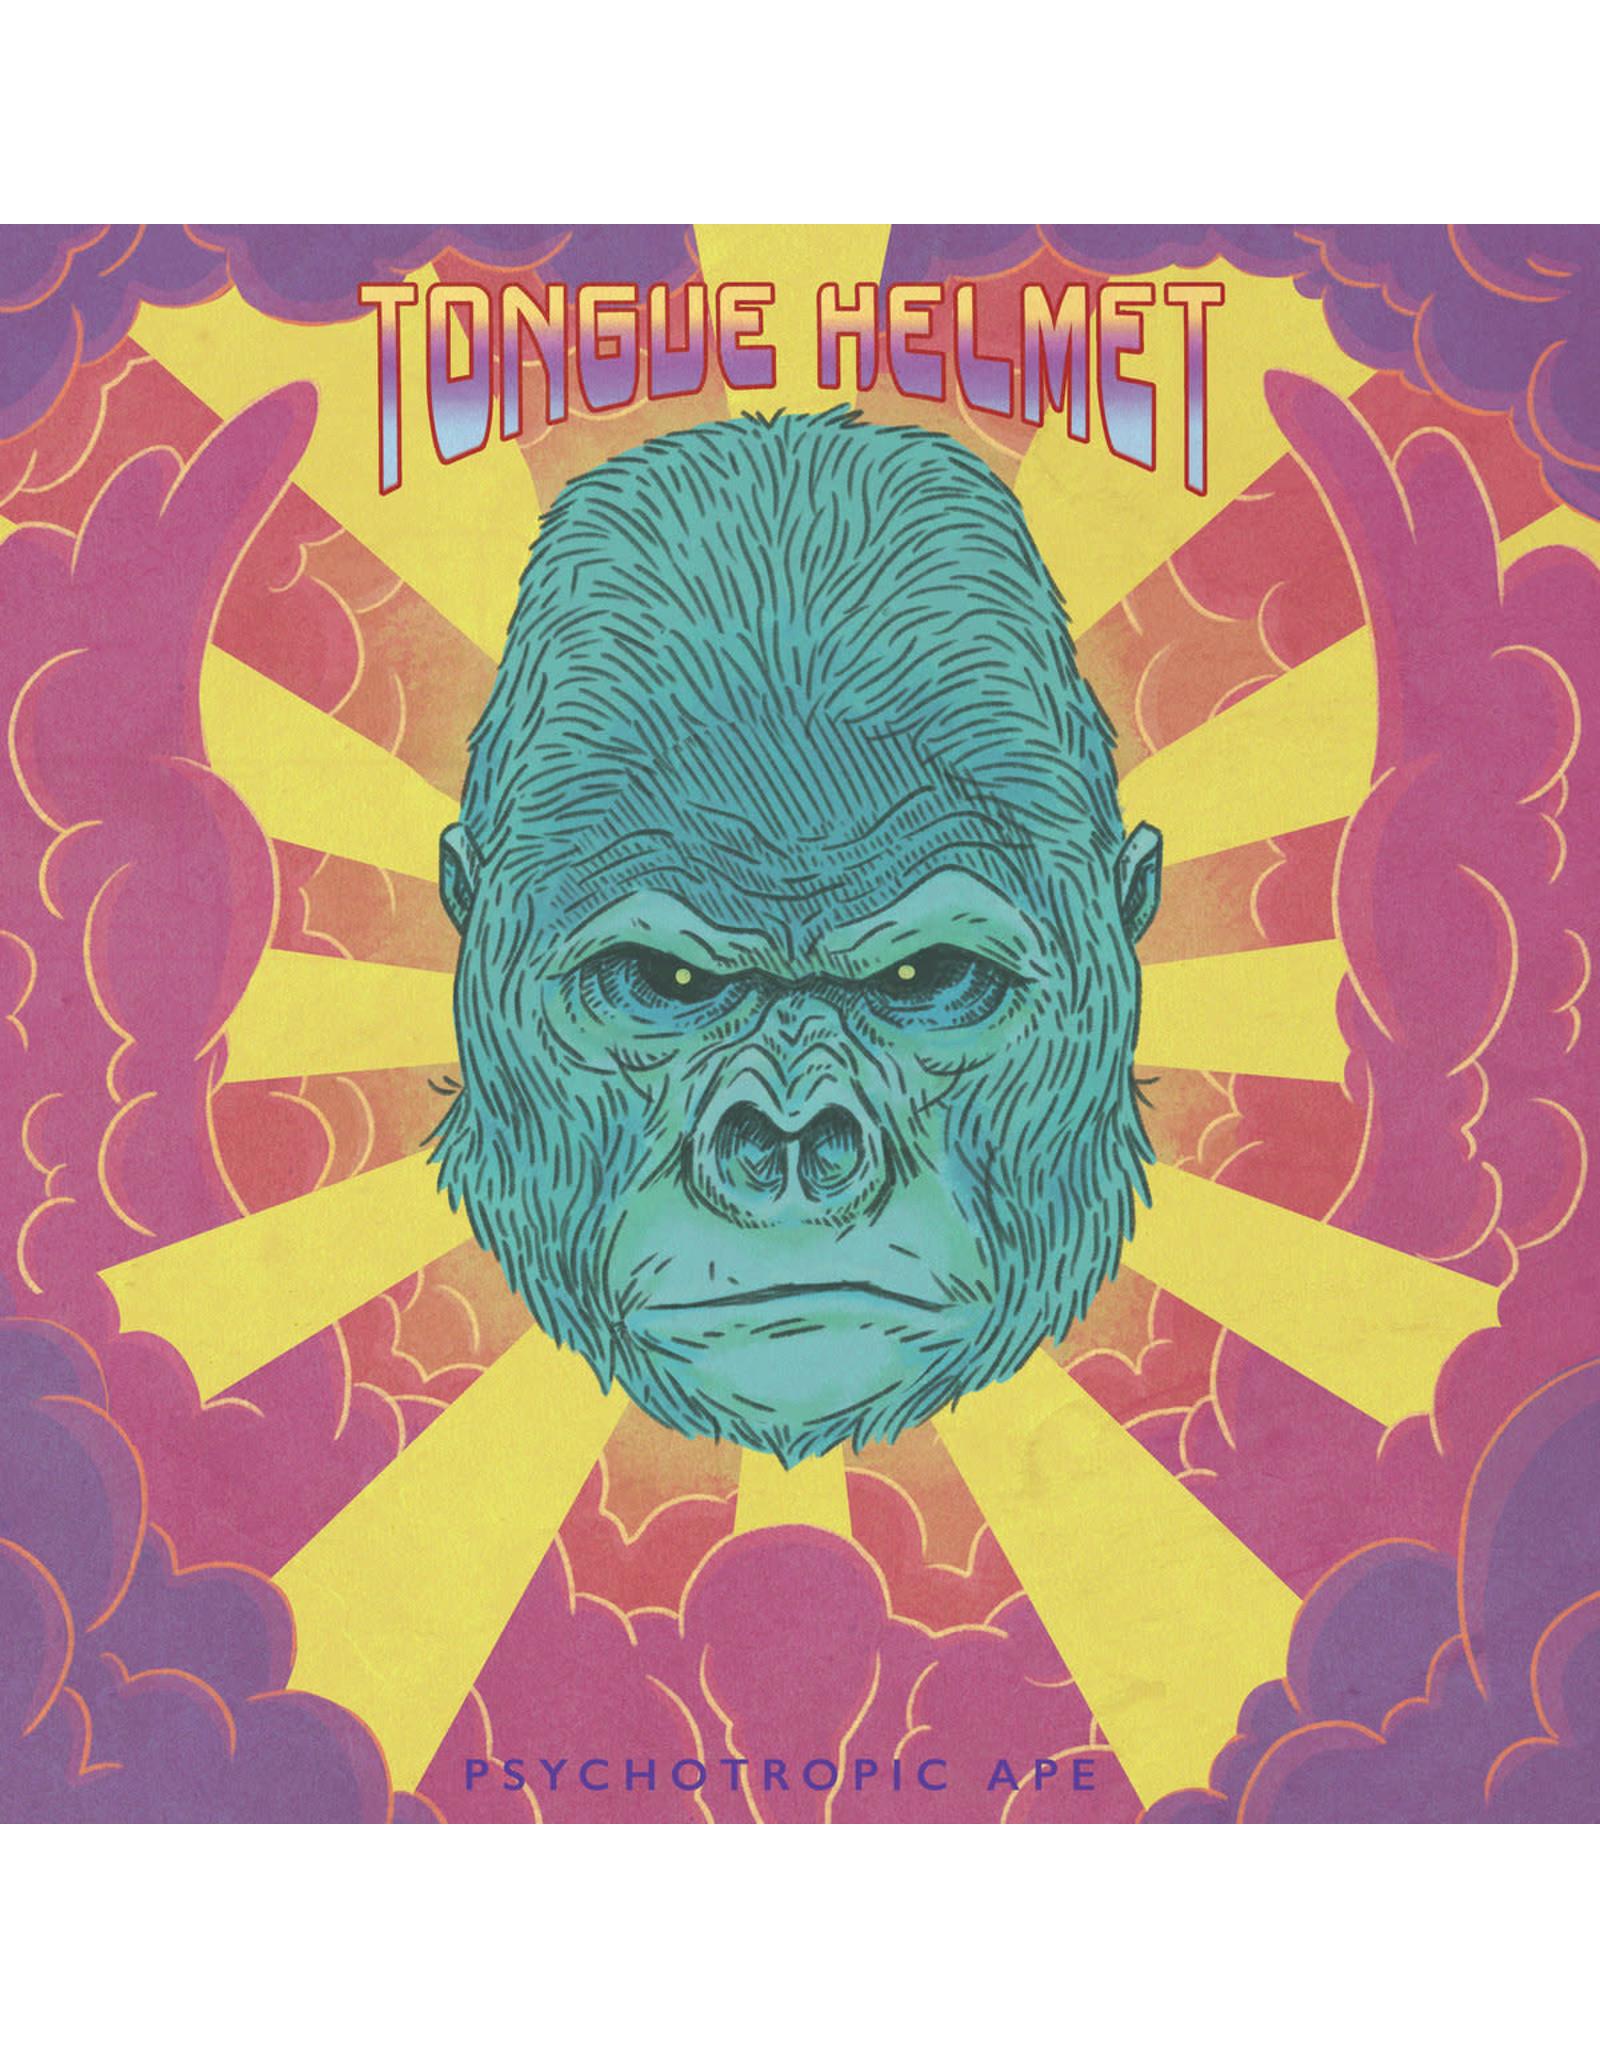 Tongue Helmet - Psychotropic Ape CD